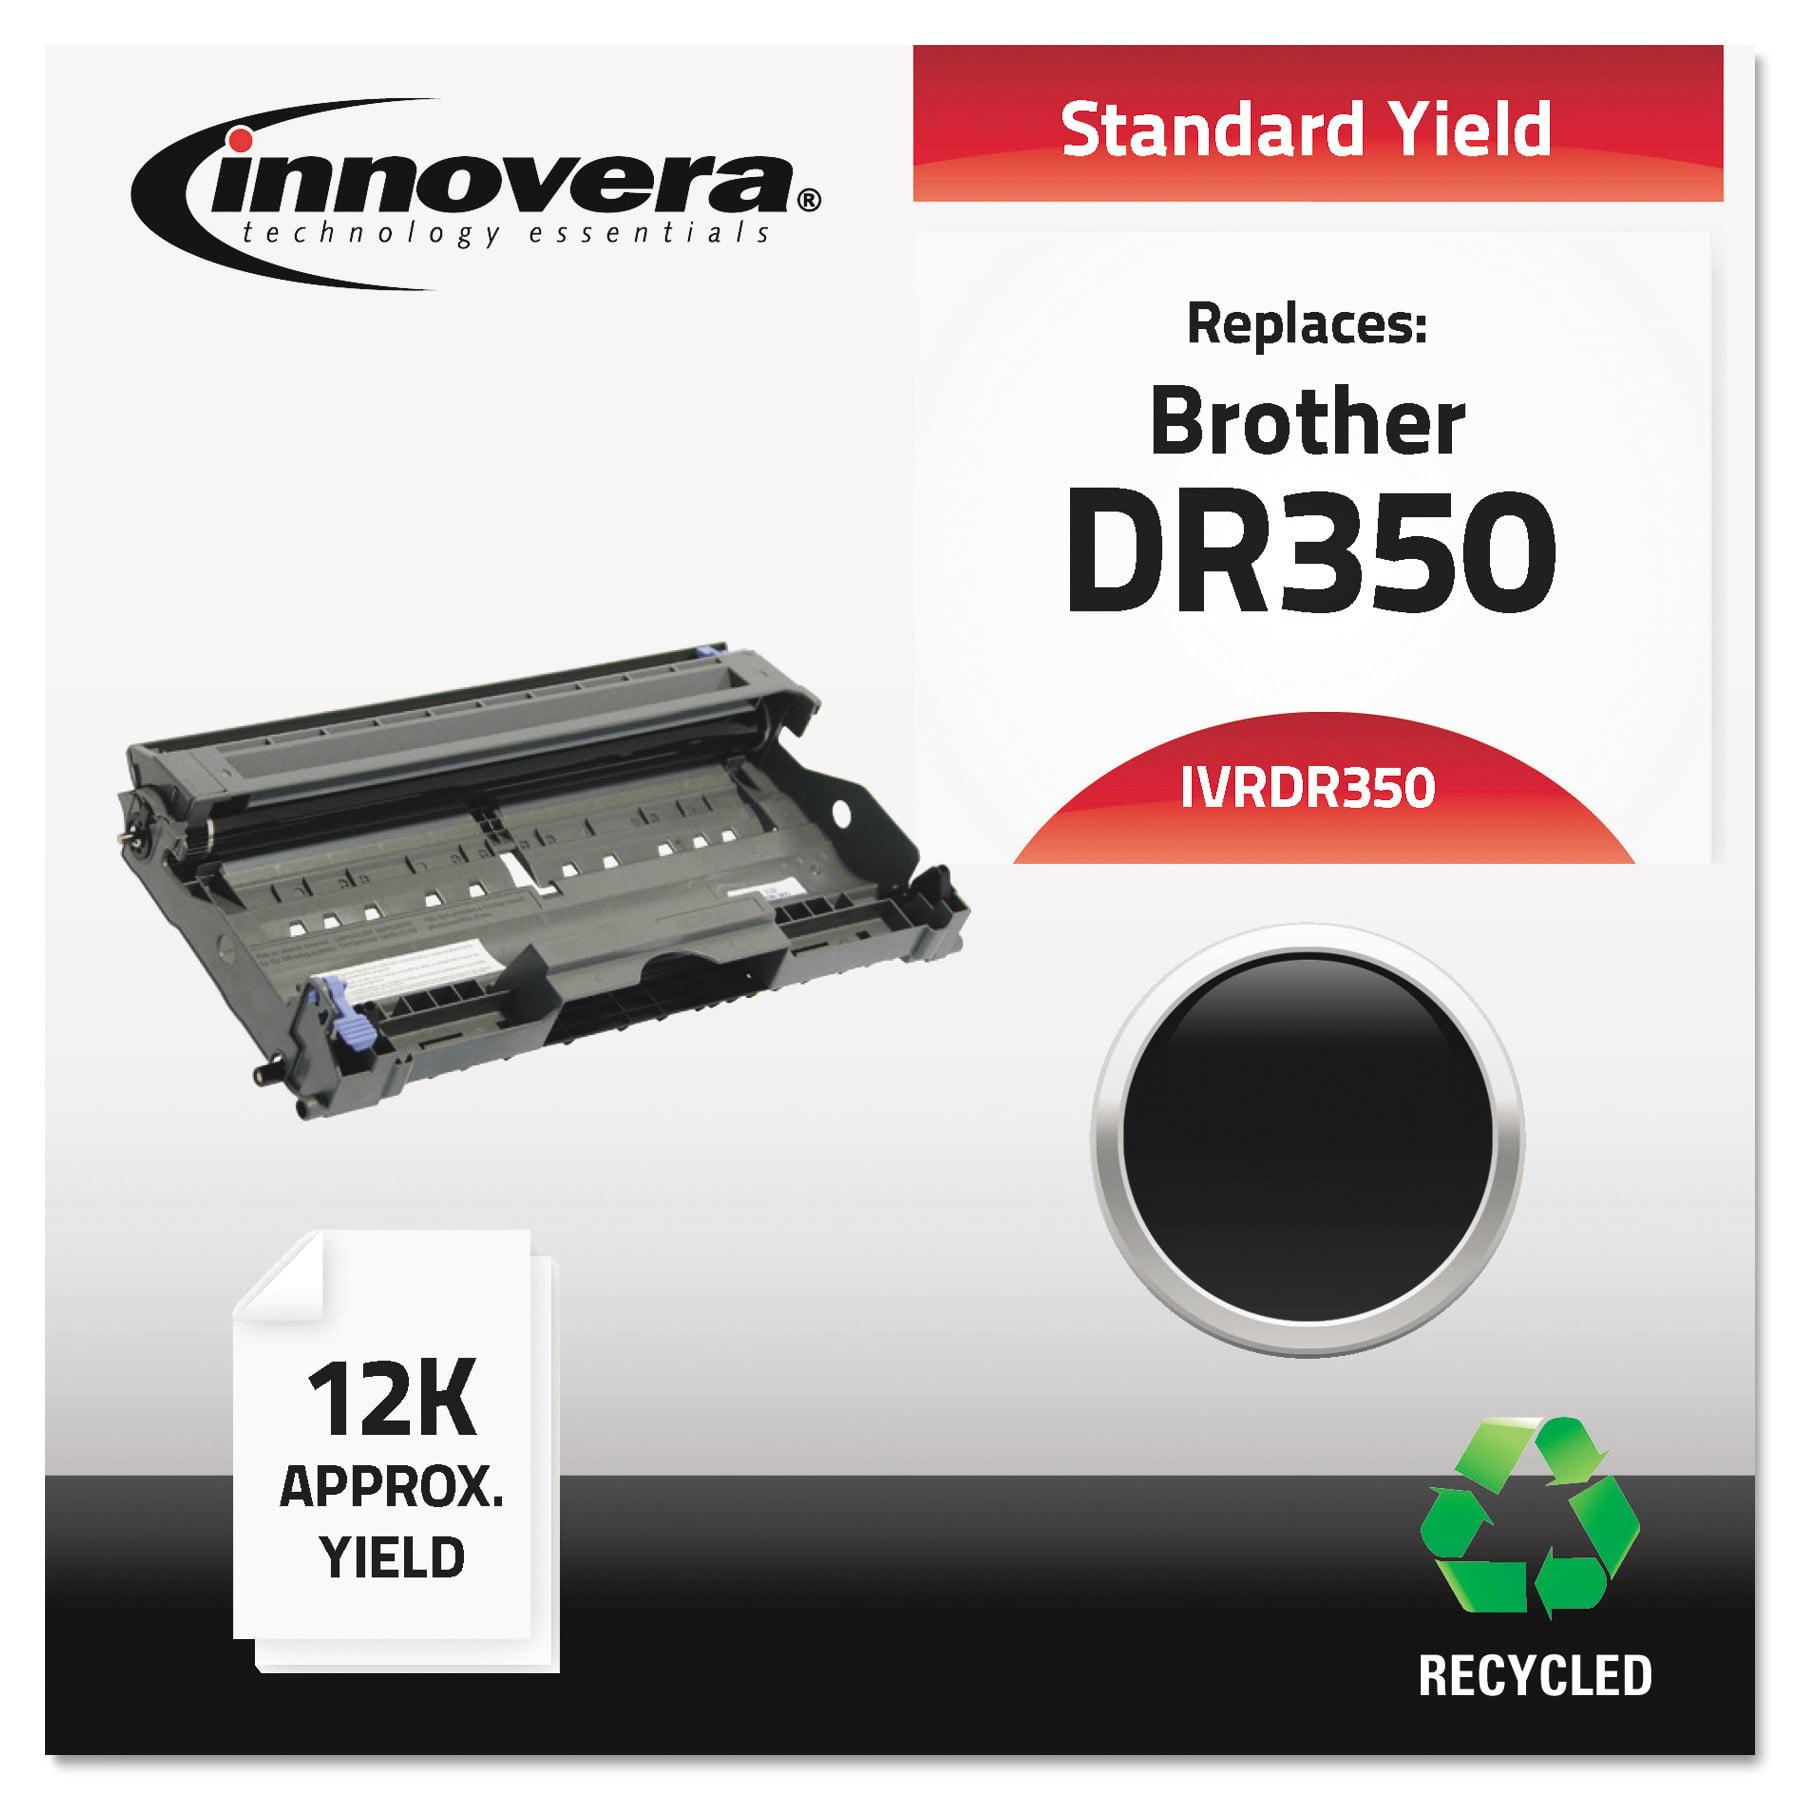 Innovera Remanufactured DR350 Drum Unit, Black